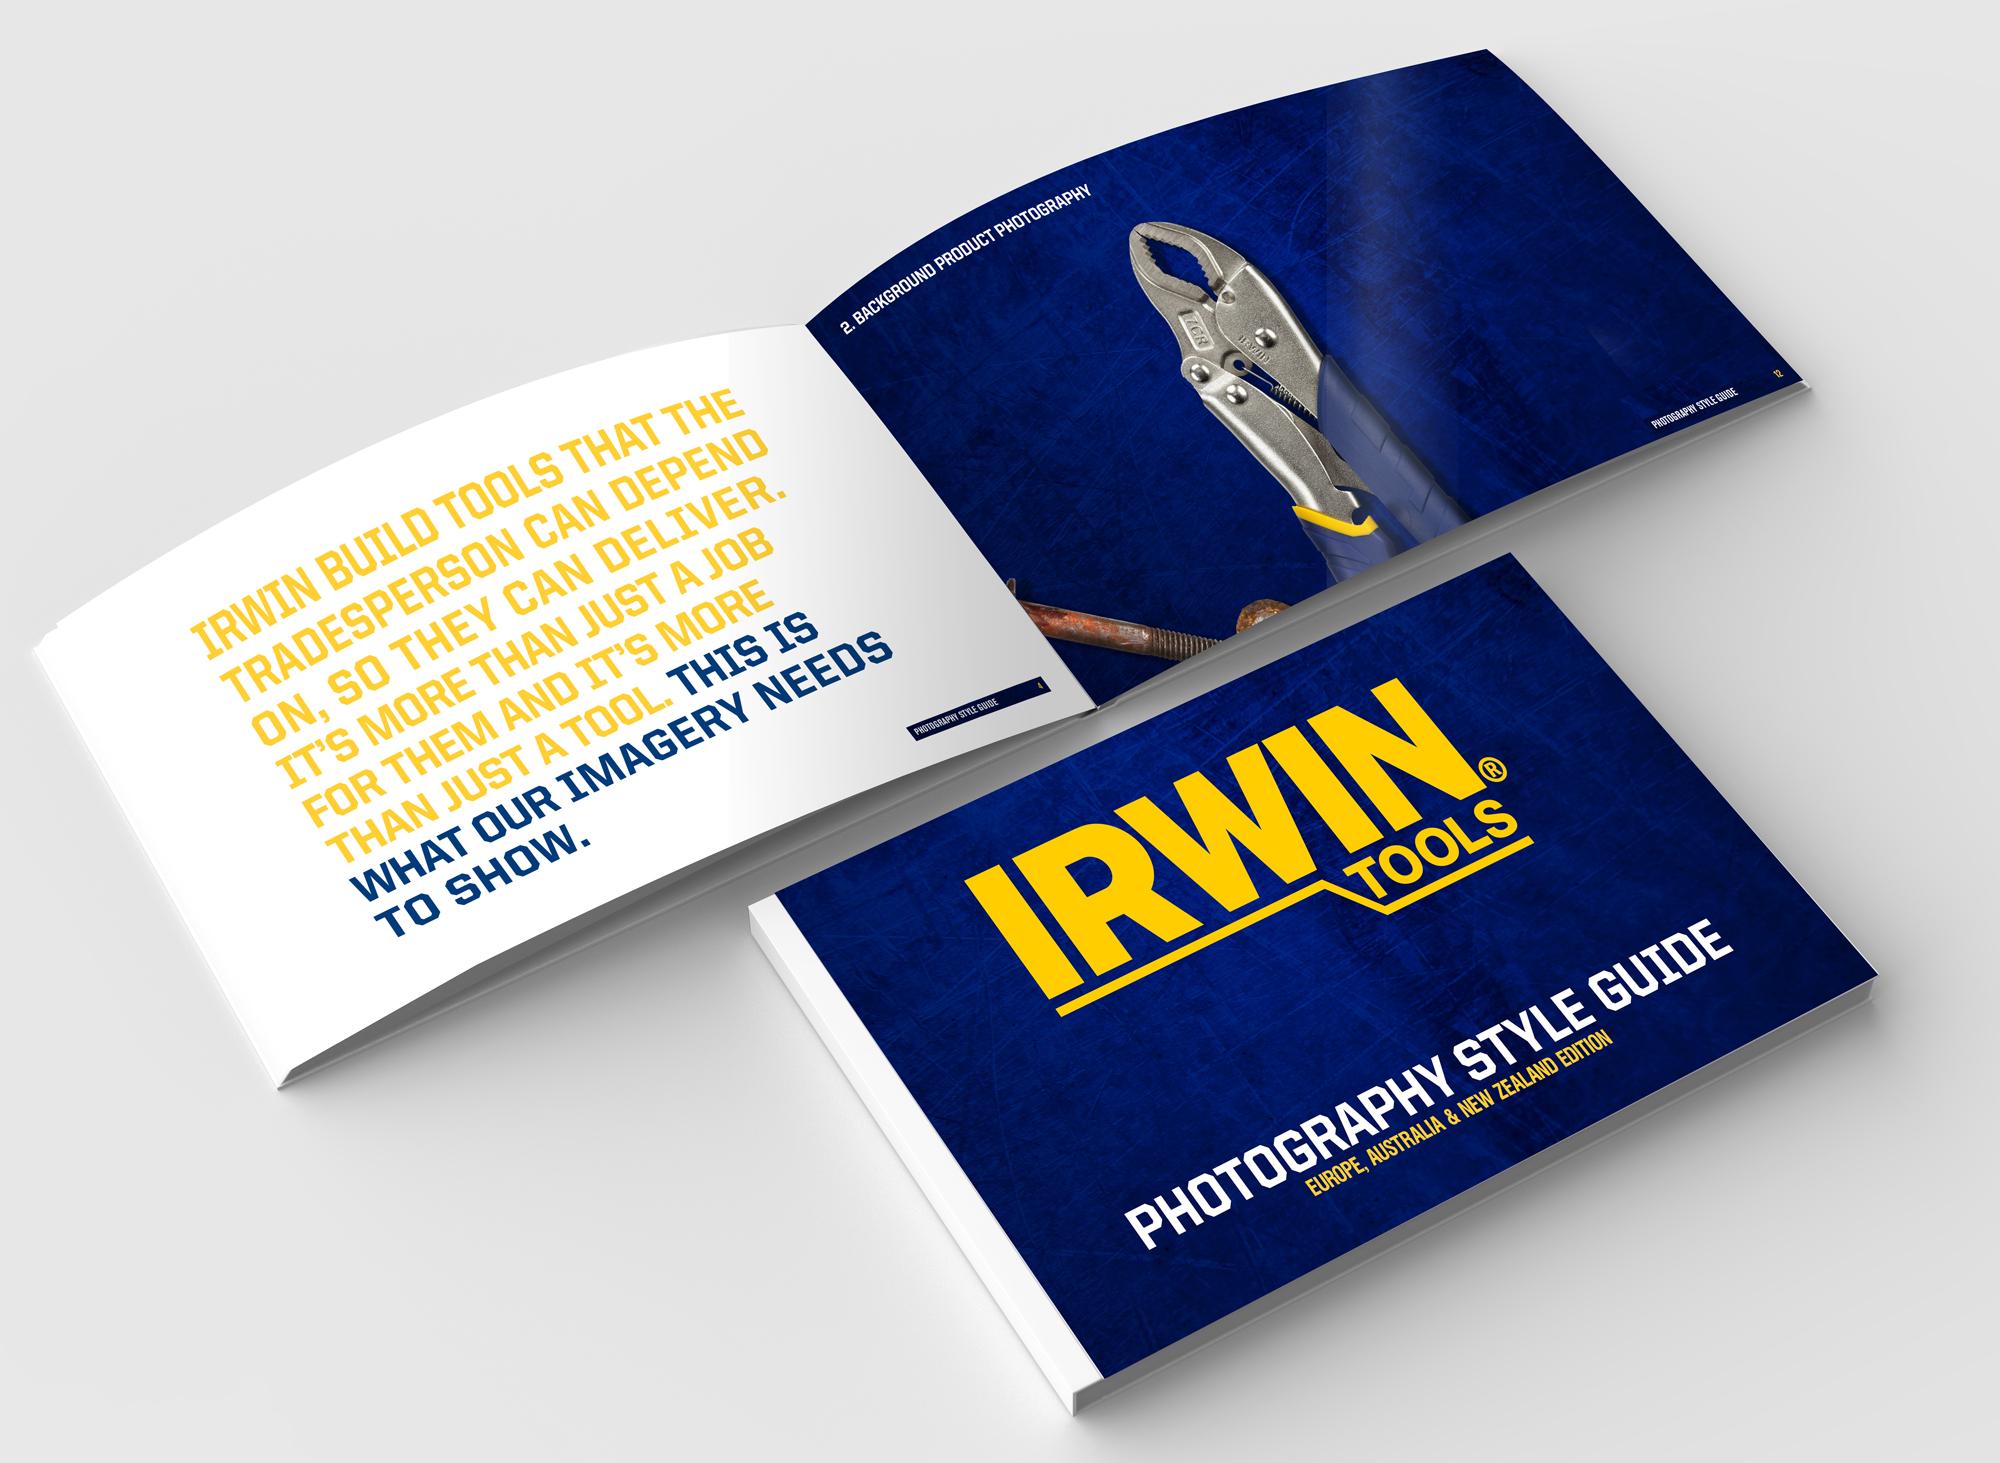 IRWIN_MAG